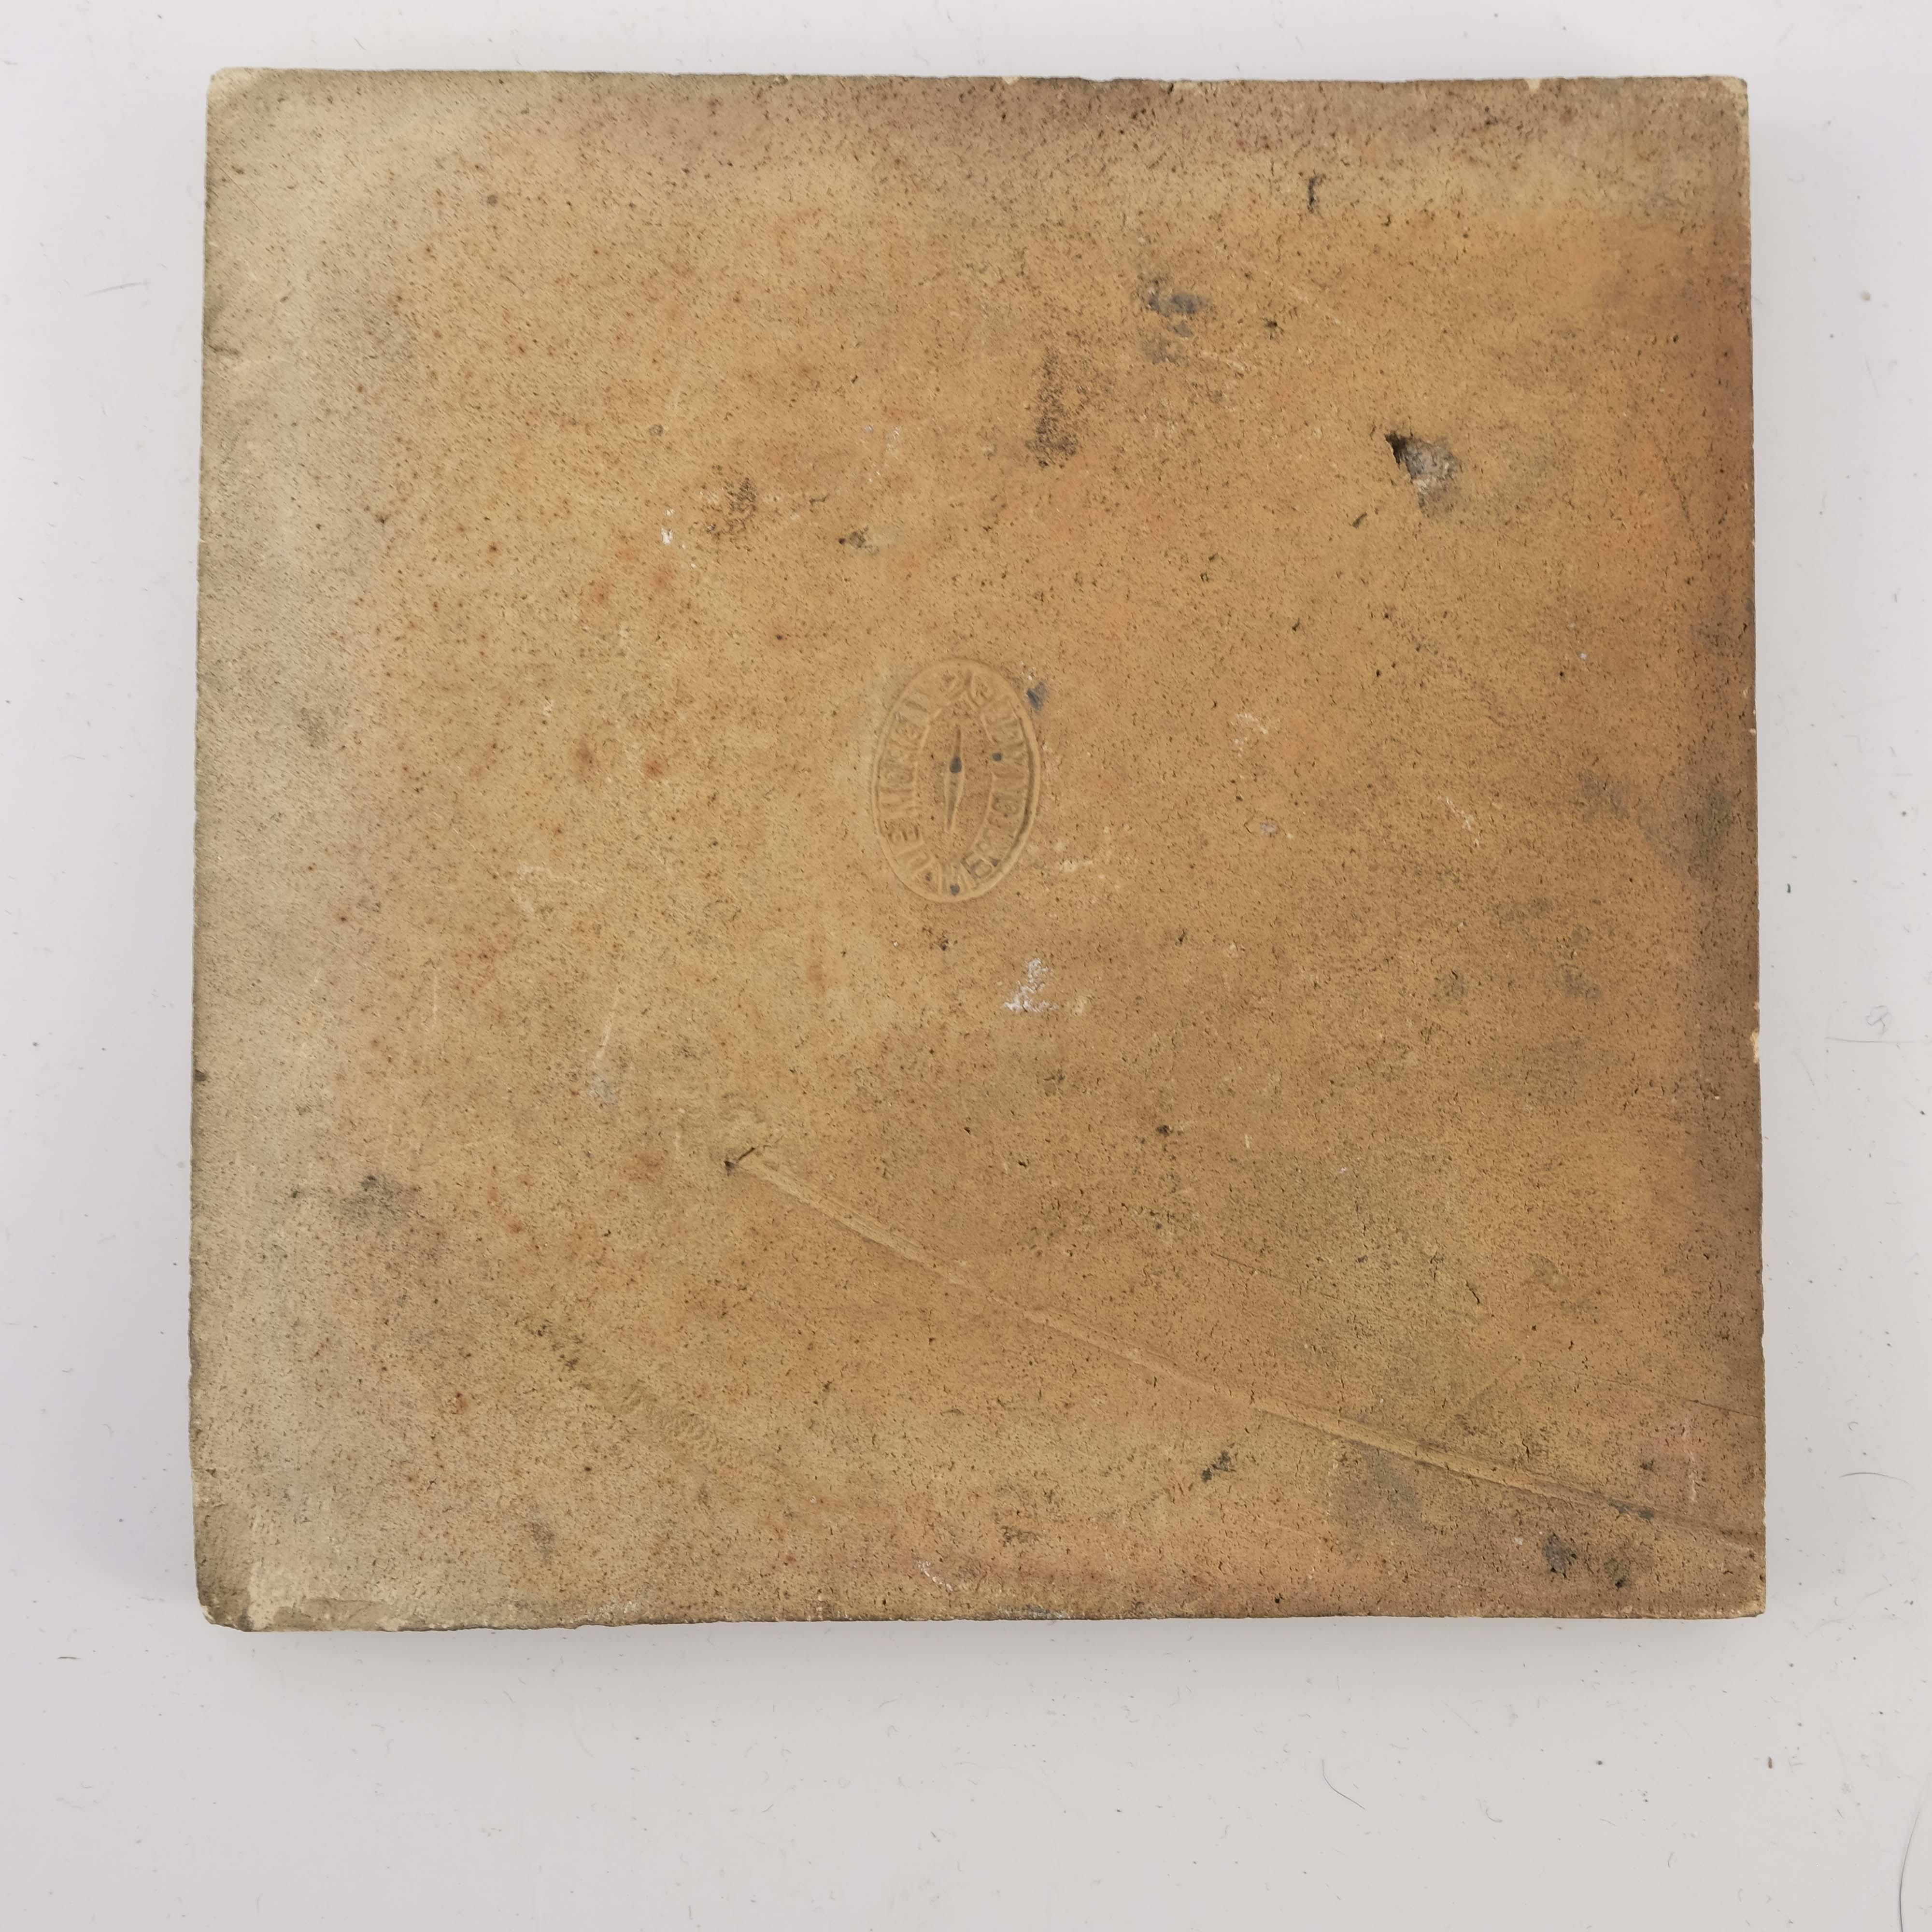 William De Morgan, a K L Rose tile - Image 2 of 2